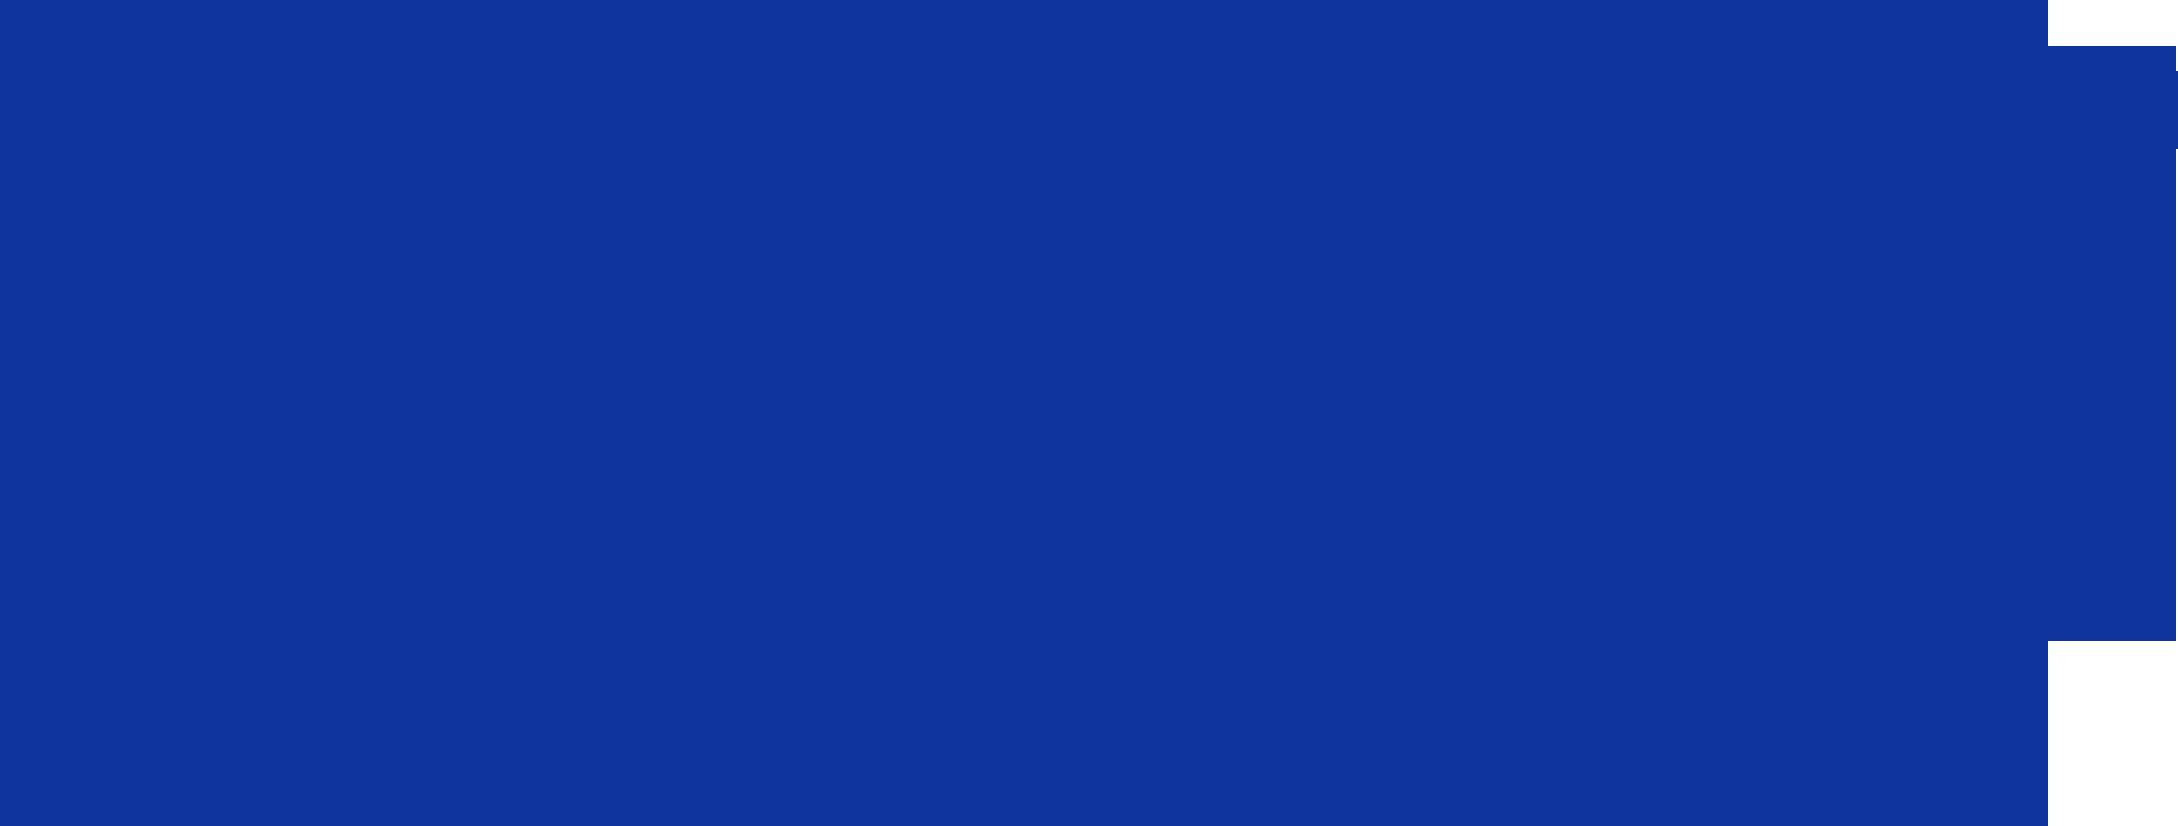 Logo Opti'Malin bleu